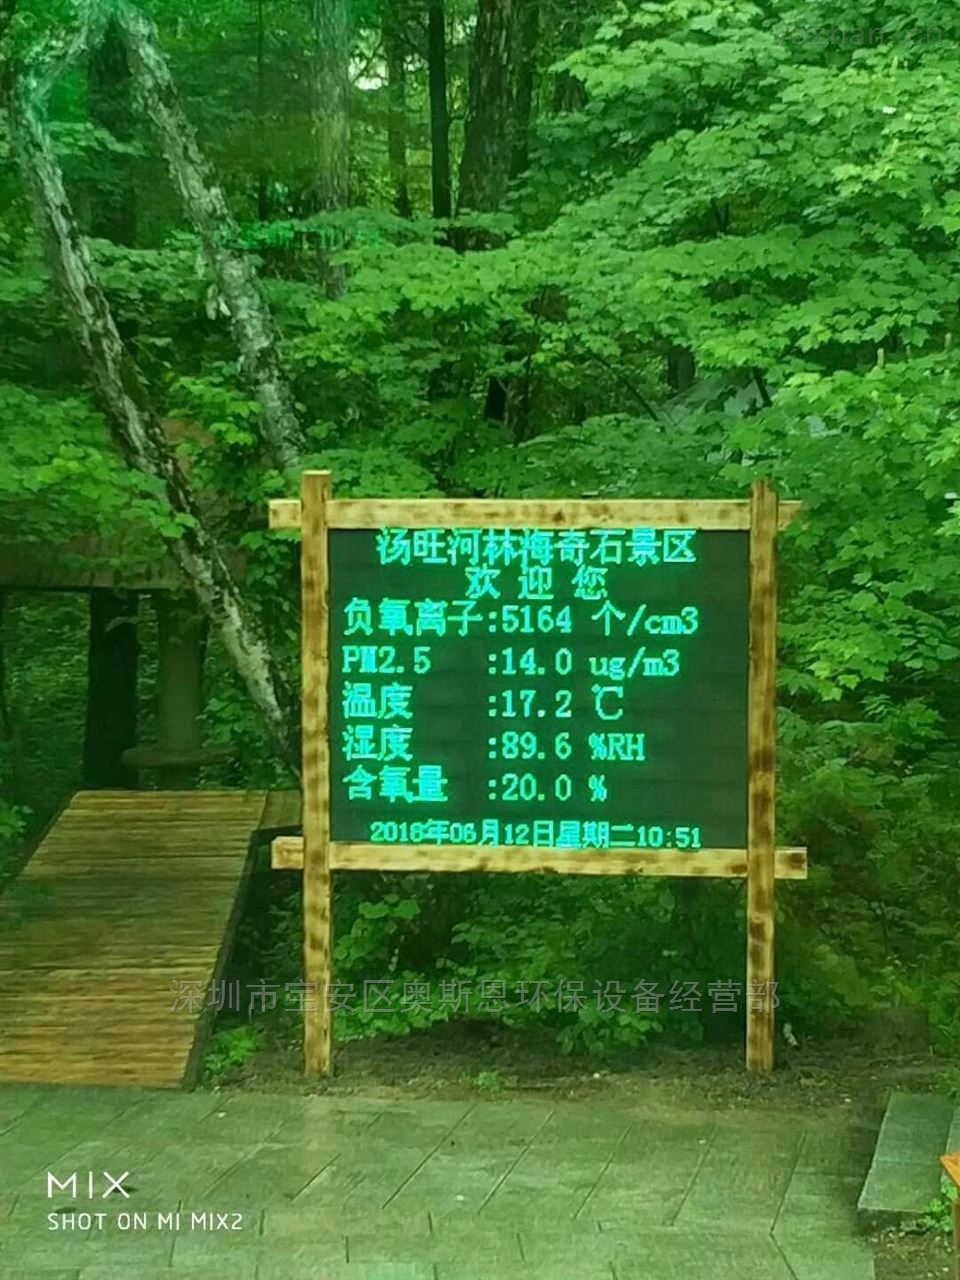 OSEN-FY-黑龙江汤旺河景区大气负氧离子在线监测系统